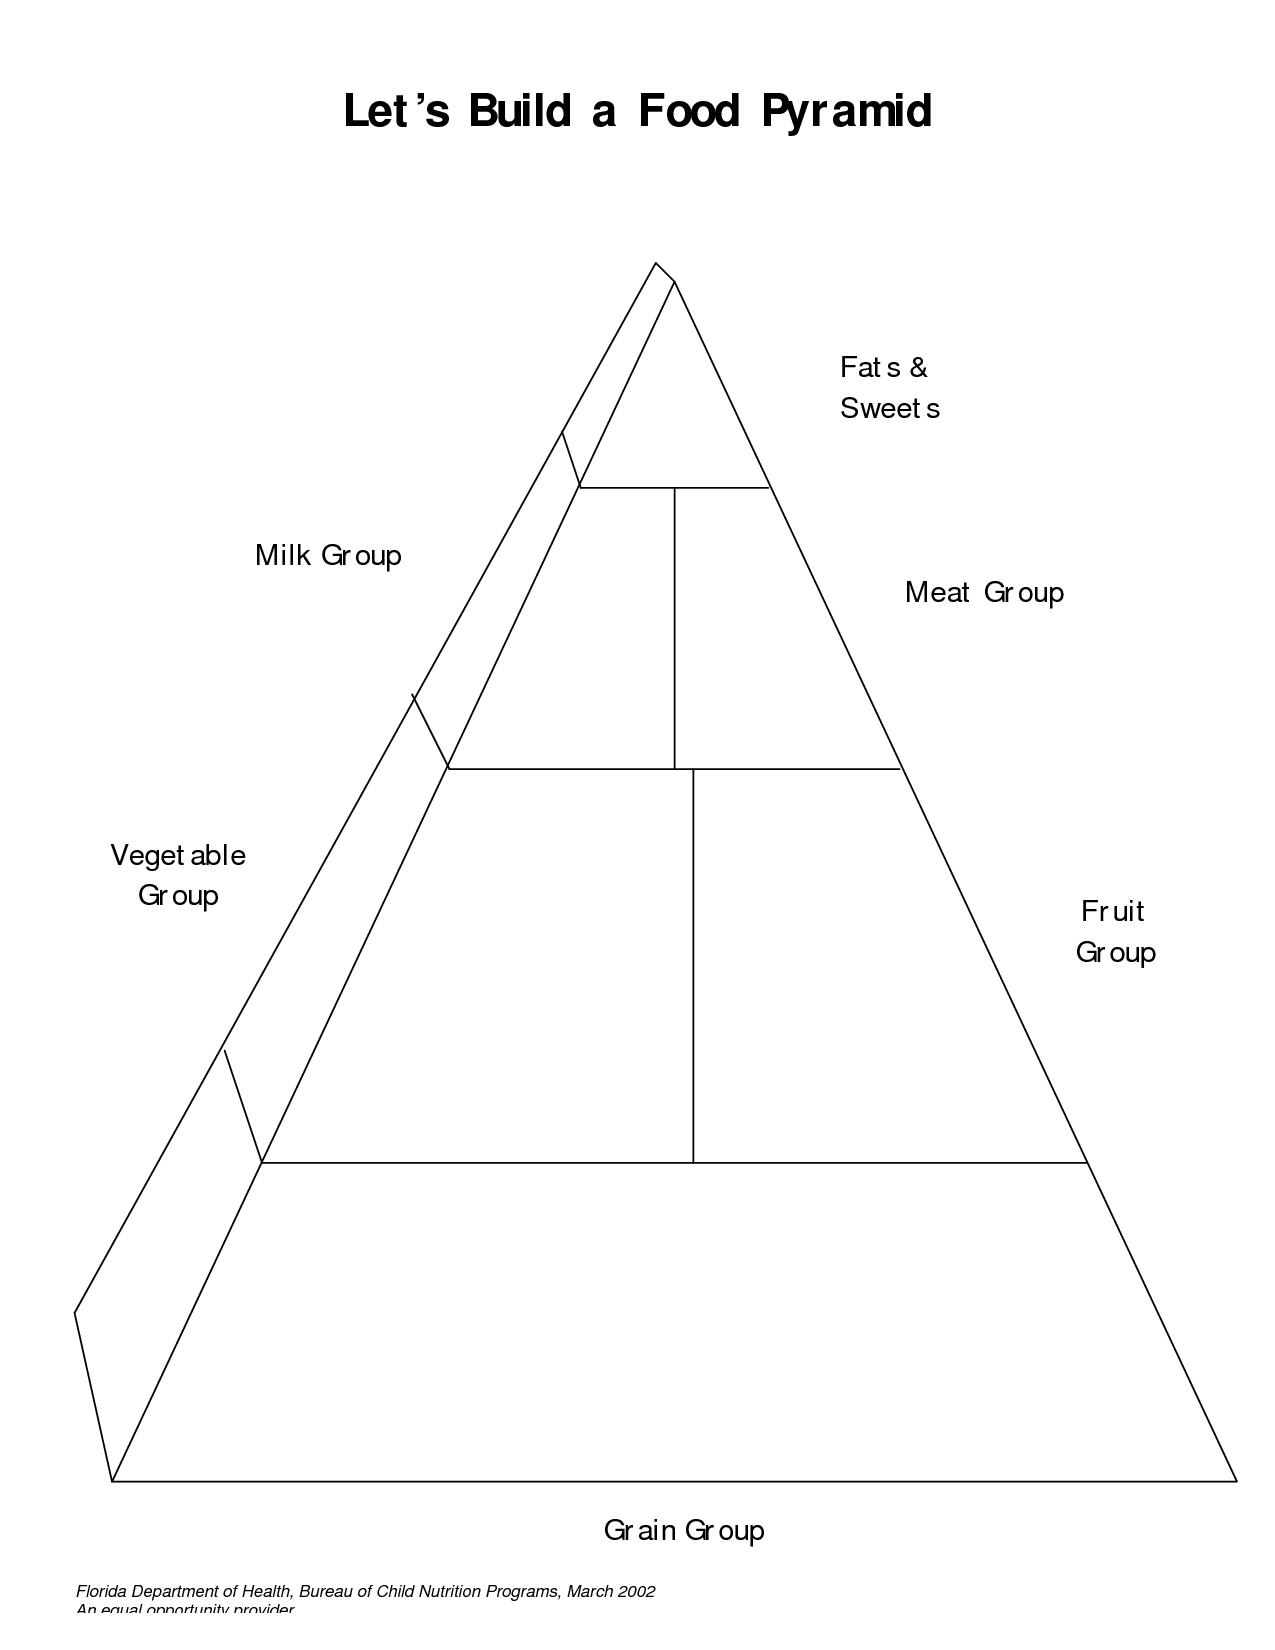 blank pyramid diagram 5 ems stinger 4 wiring 6 best images of energy worksheet